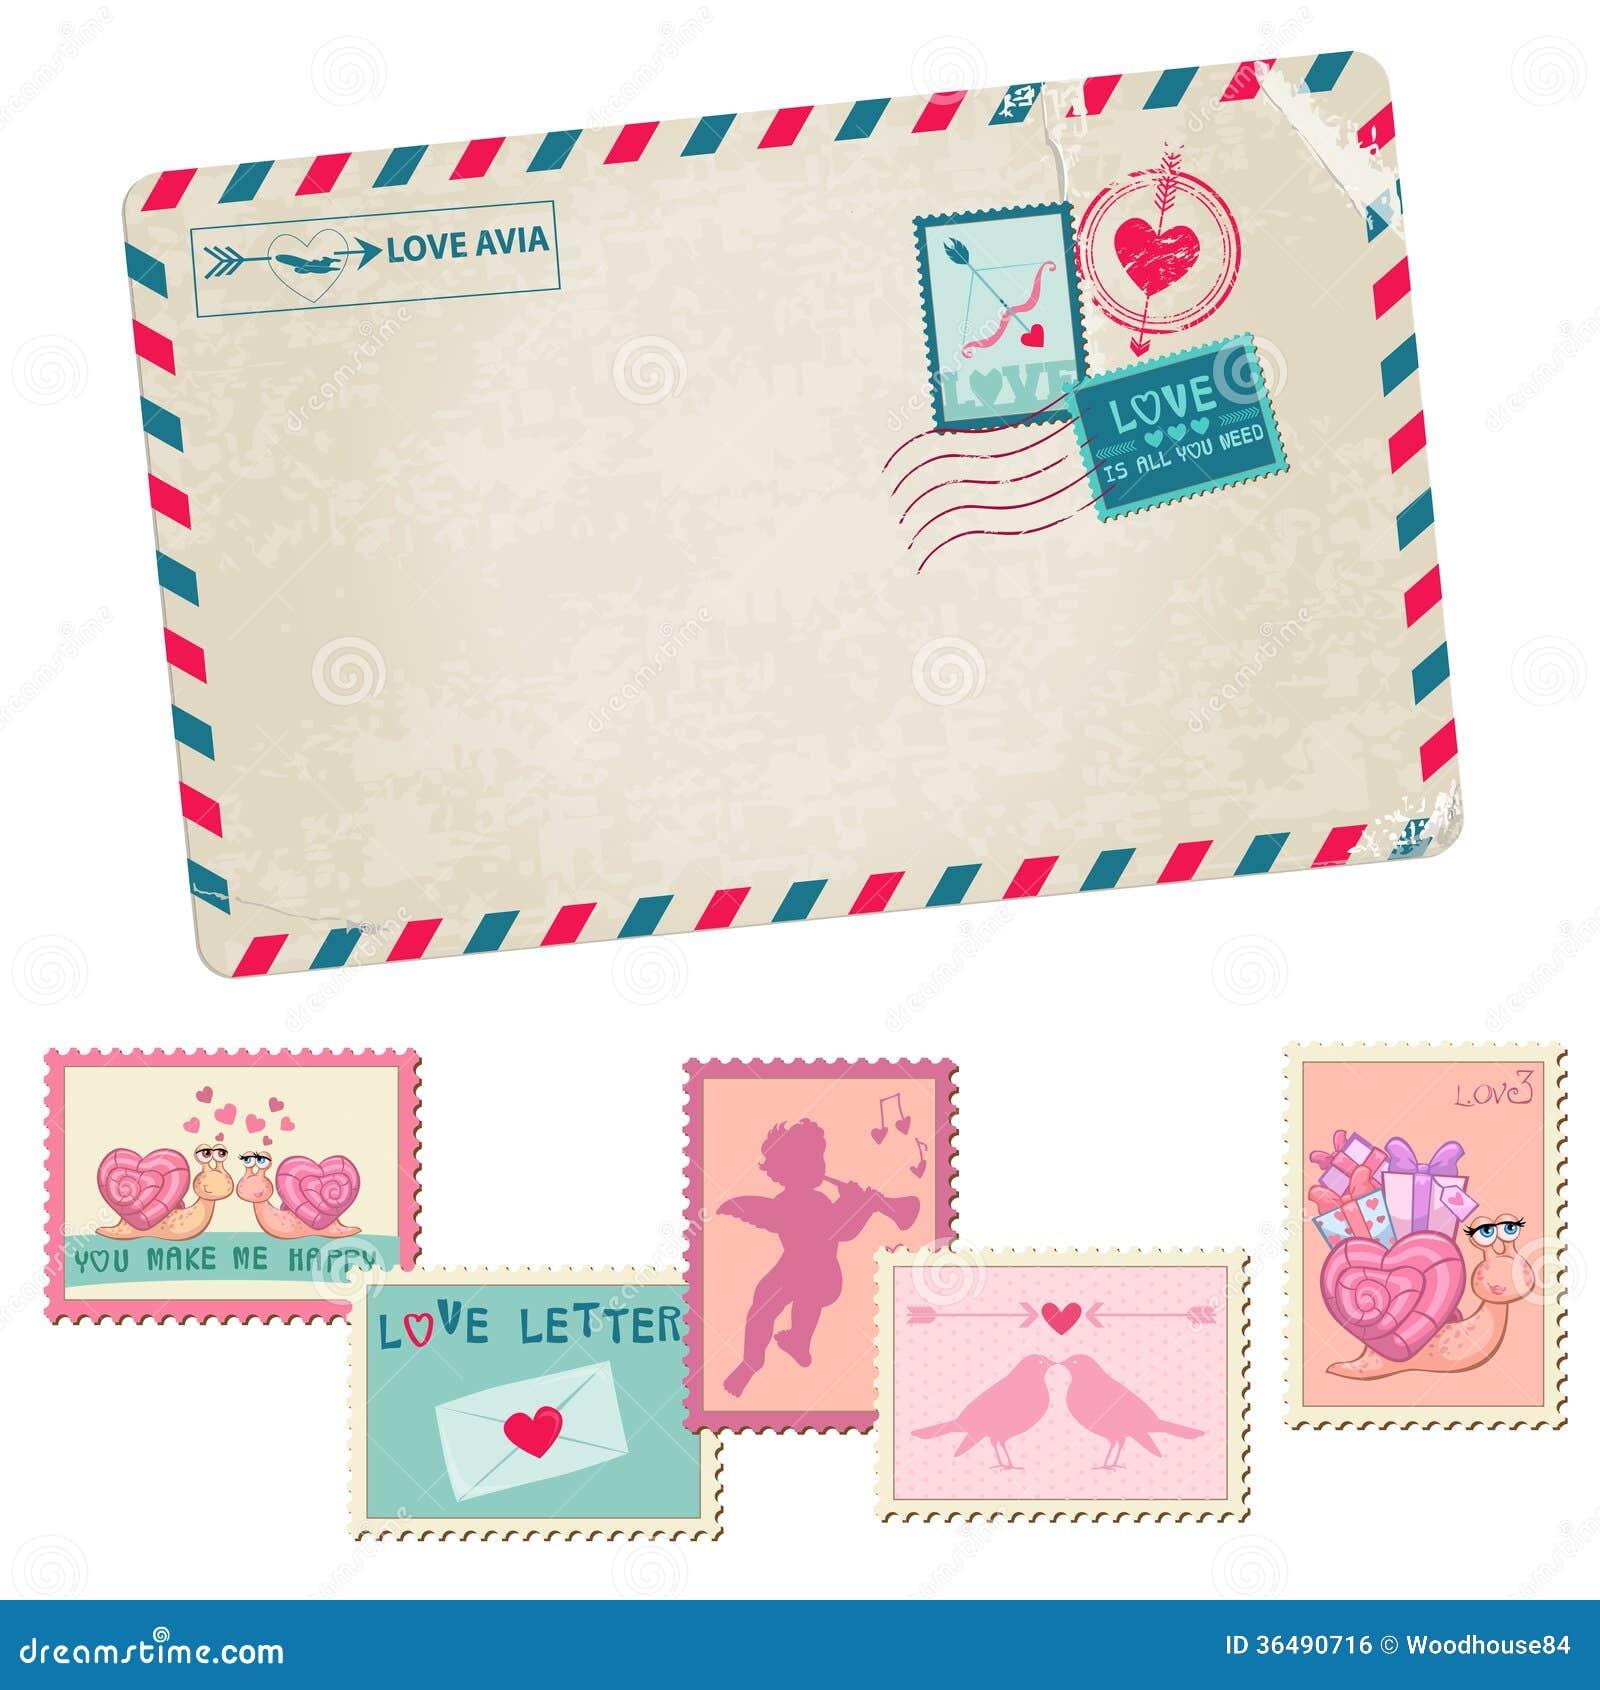 Love Letter - Vintage Postcard Royalty Free Stock Image ...